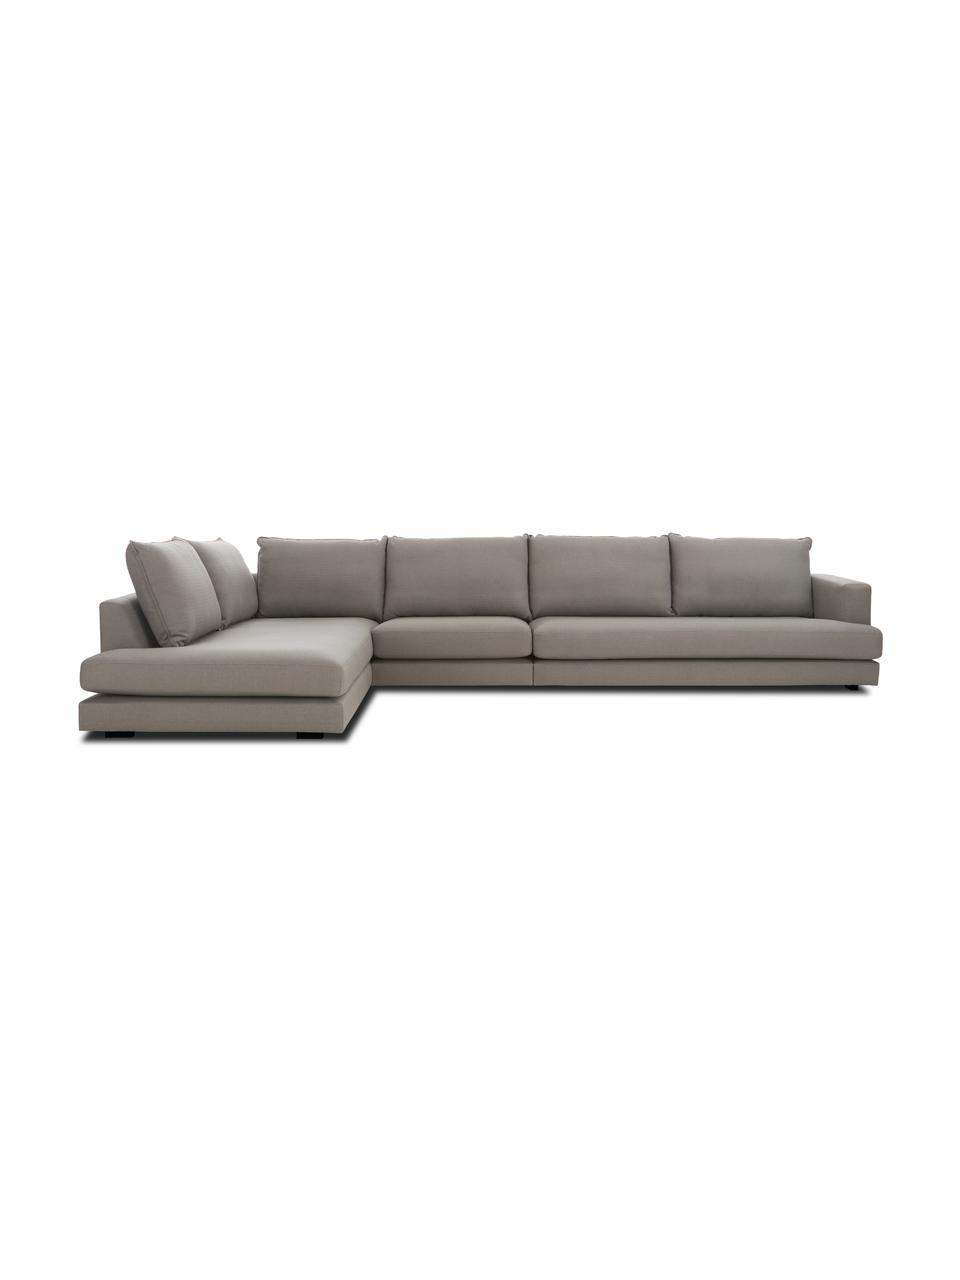 Très grand canapé d'anglegris foncé Tribeca, Gris foncé